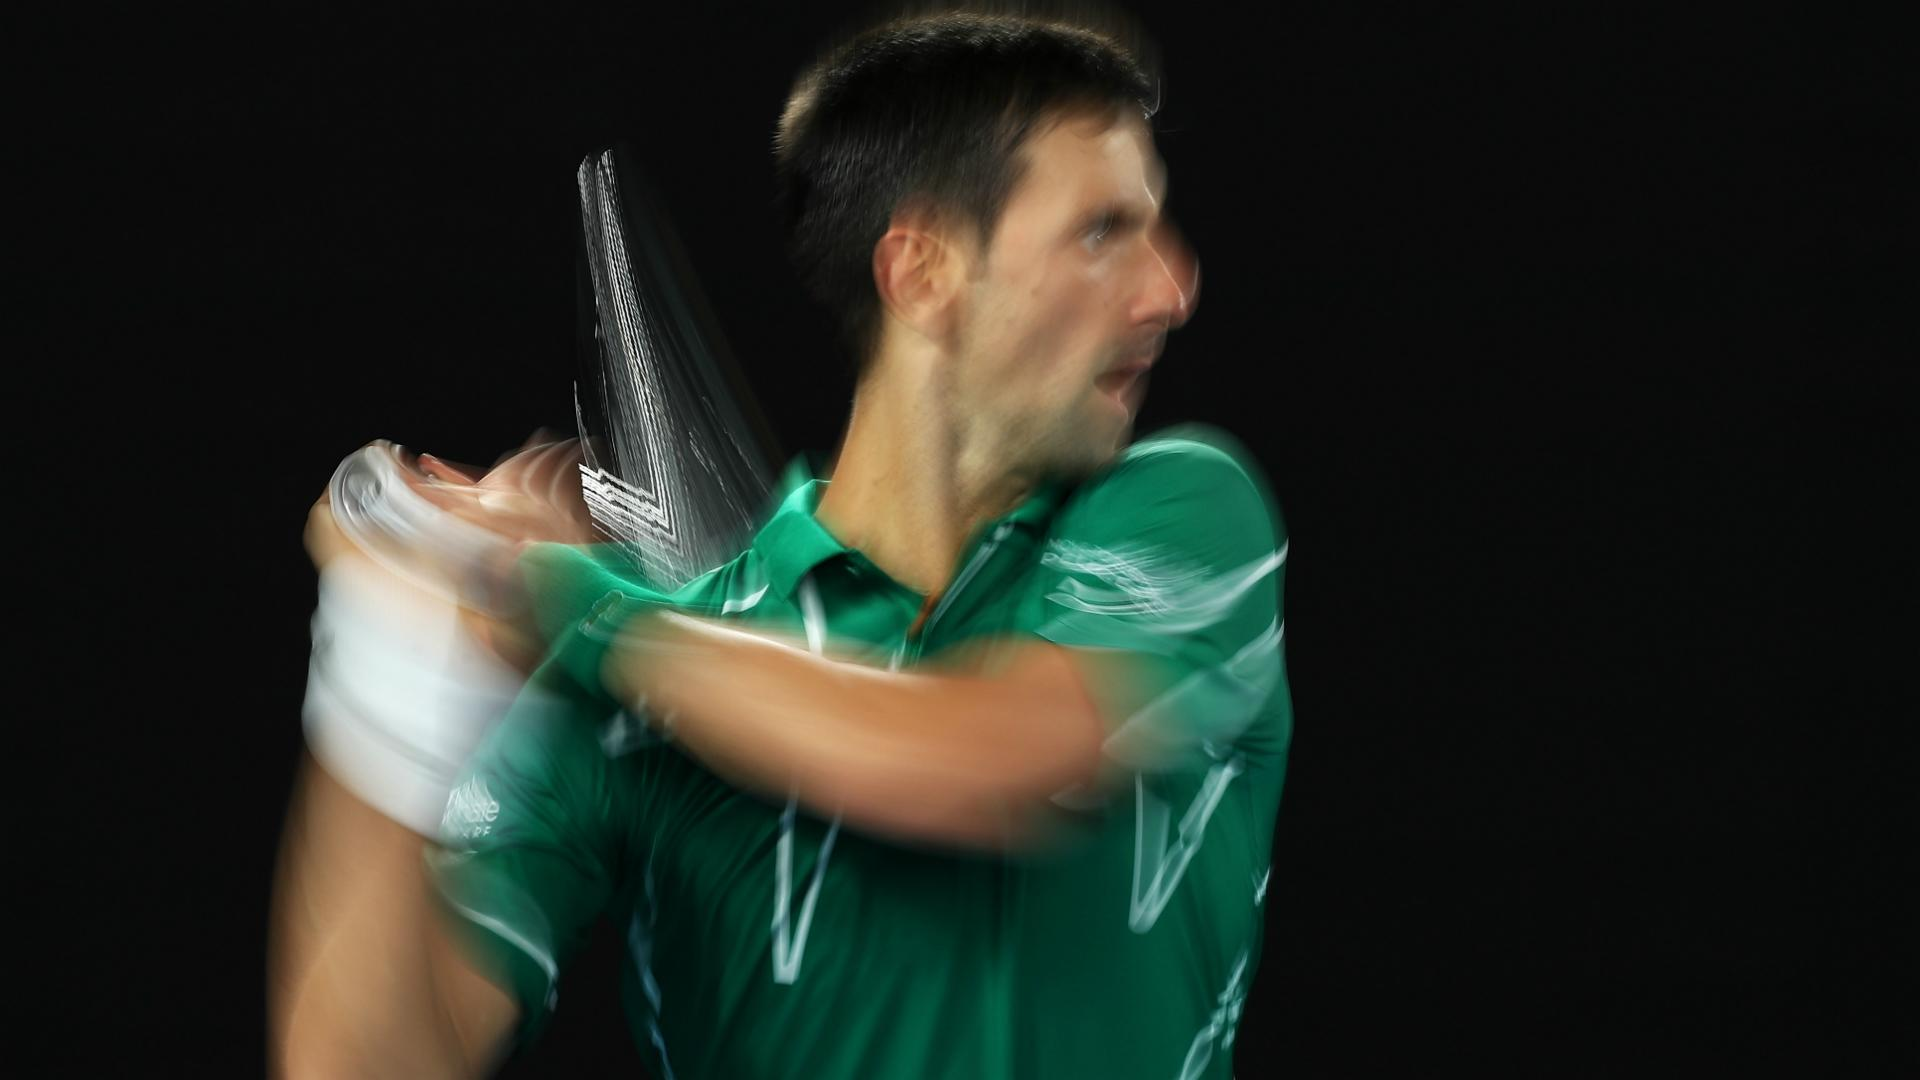 Australian Open 2020 Novak Djokovic Results And Form Ahead